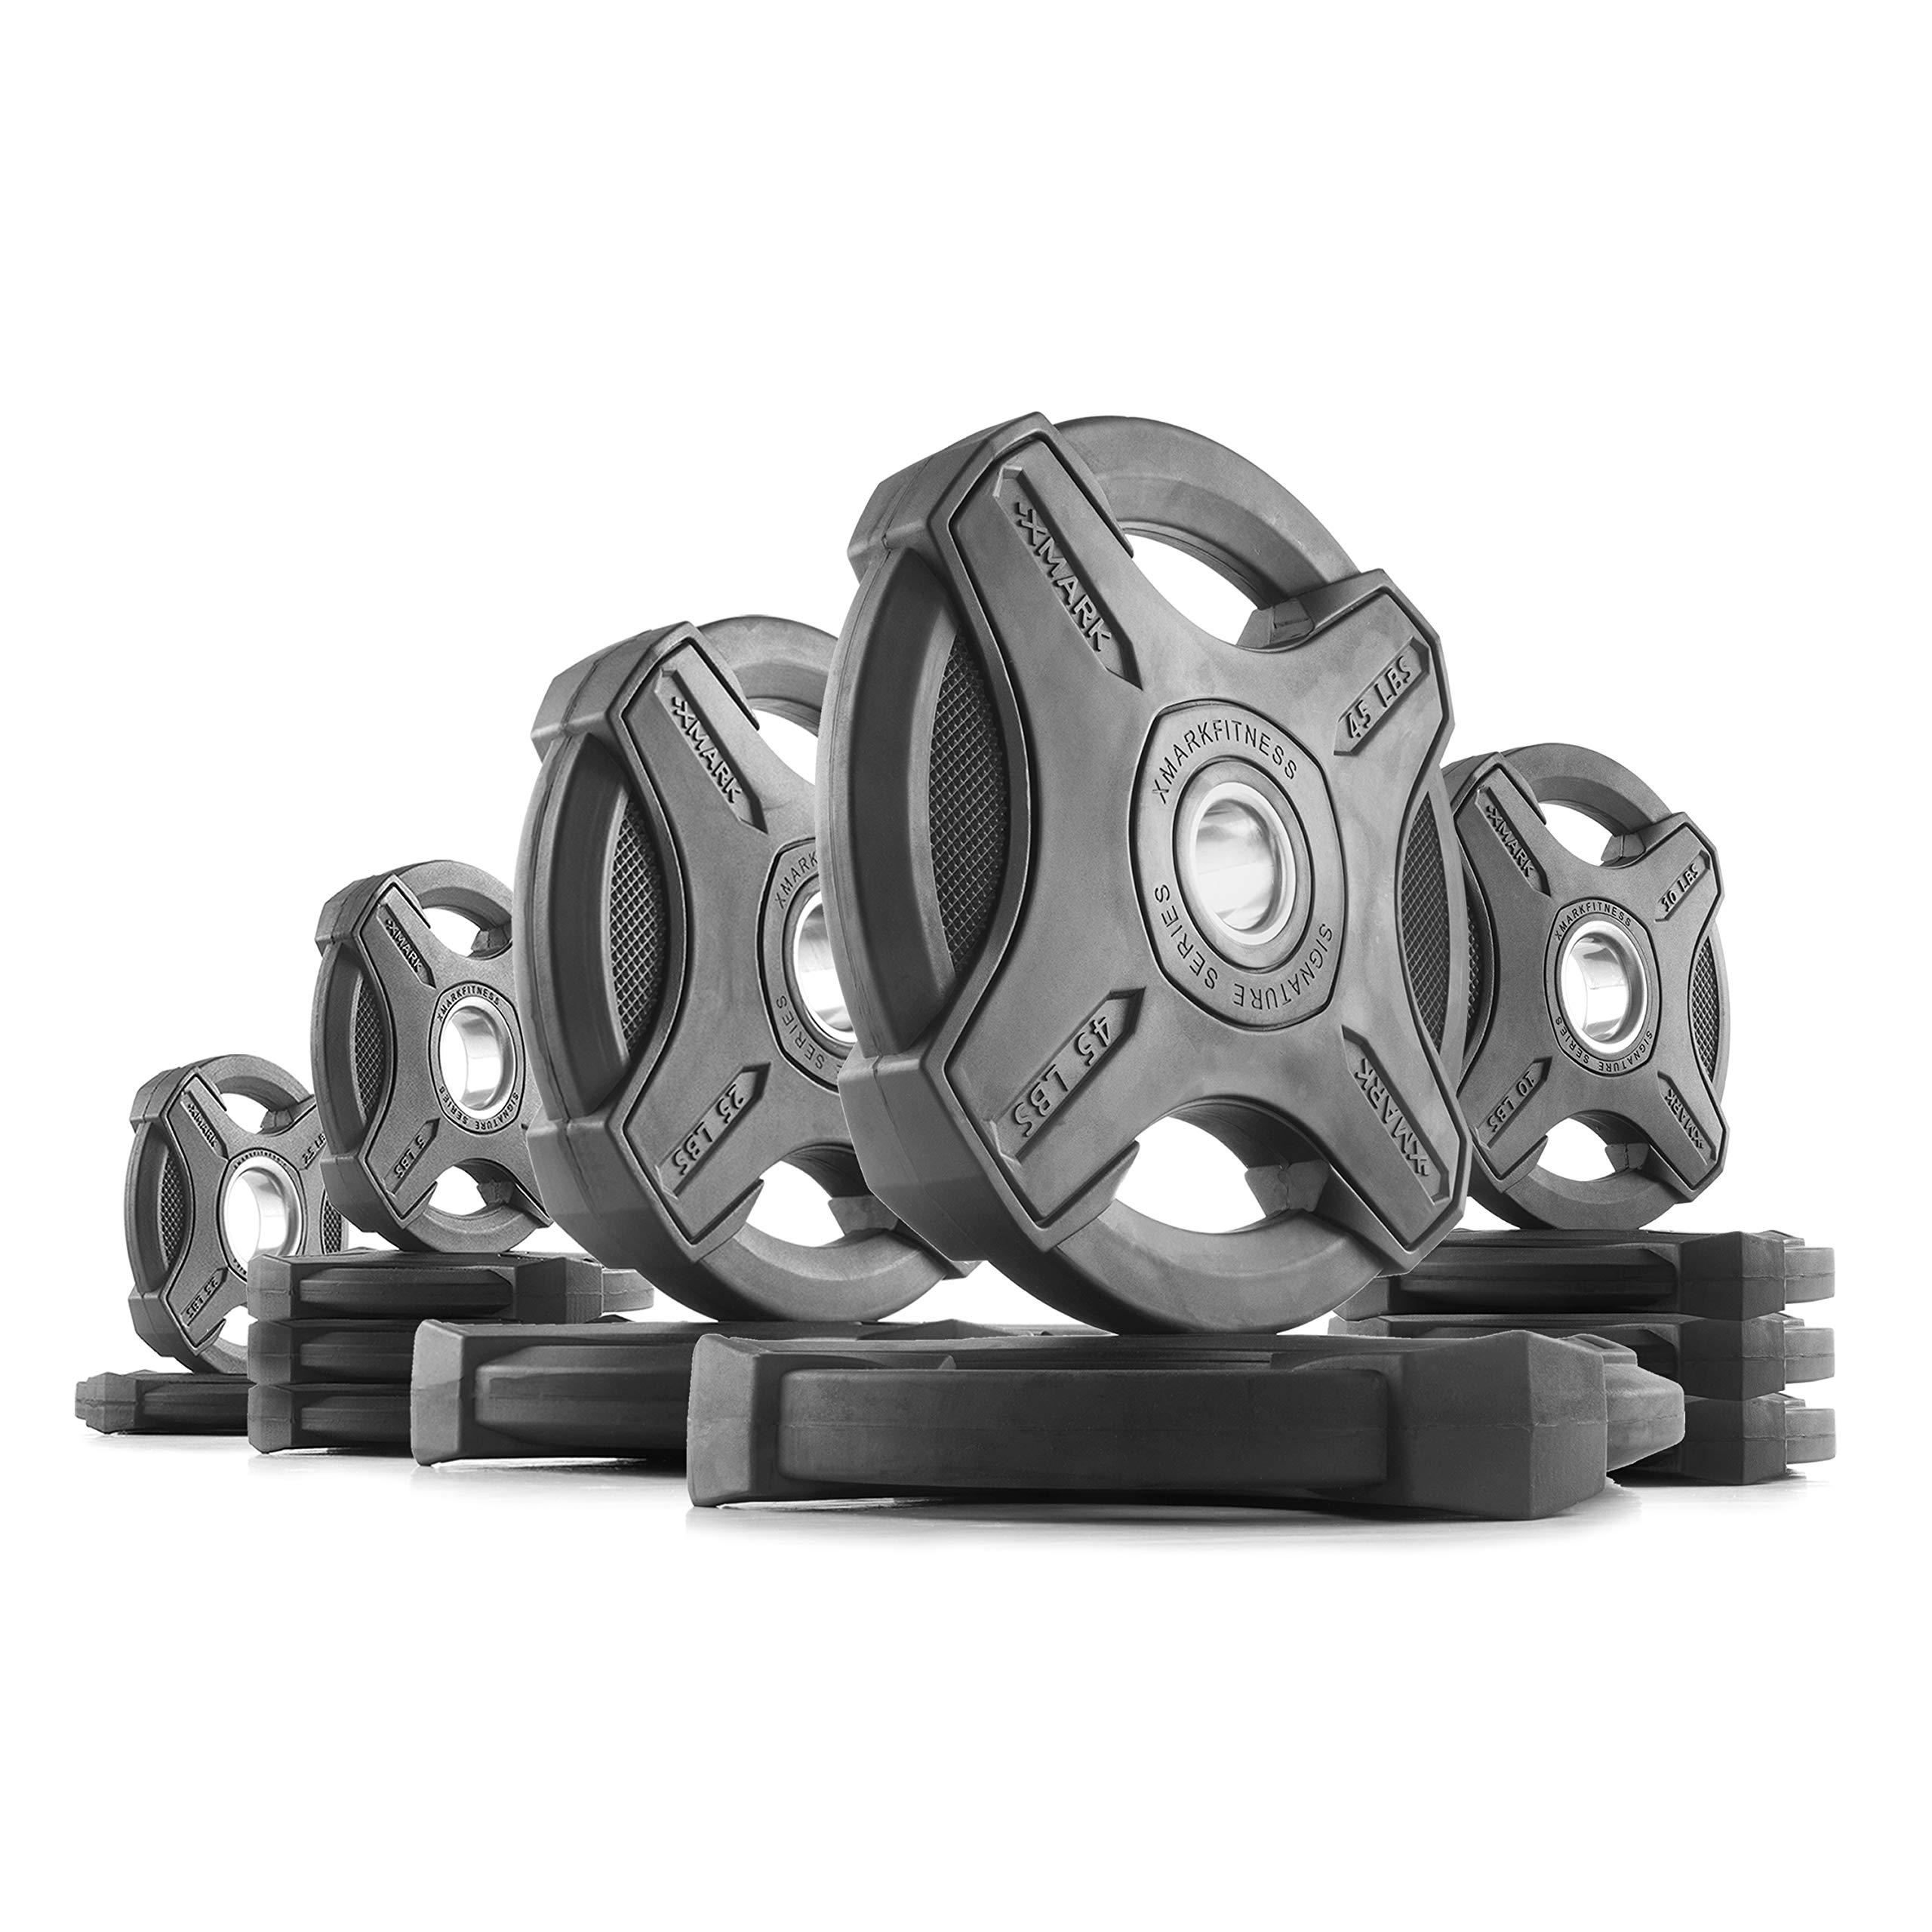 XMark 235 lb Set Signature Plates, One-Year Warranty, Olympic Weight Plates, Cutting-Edge Design